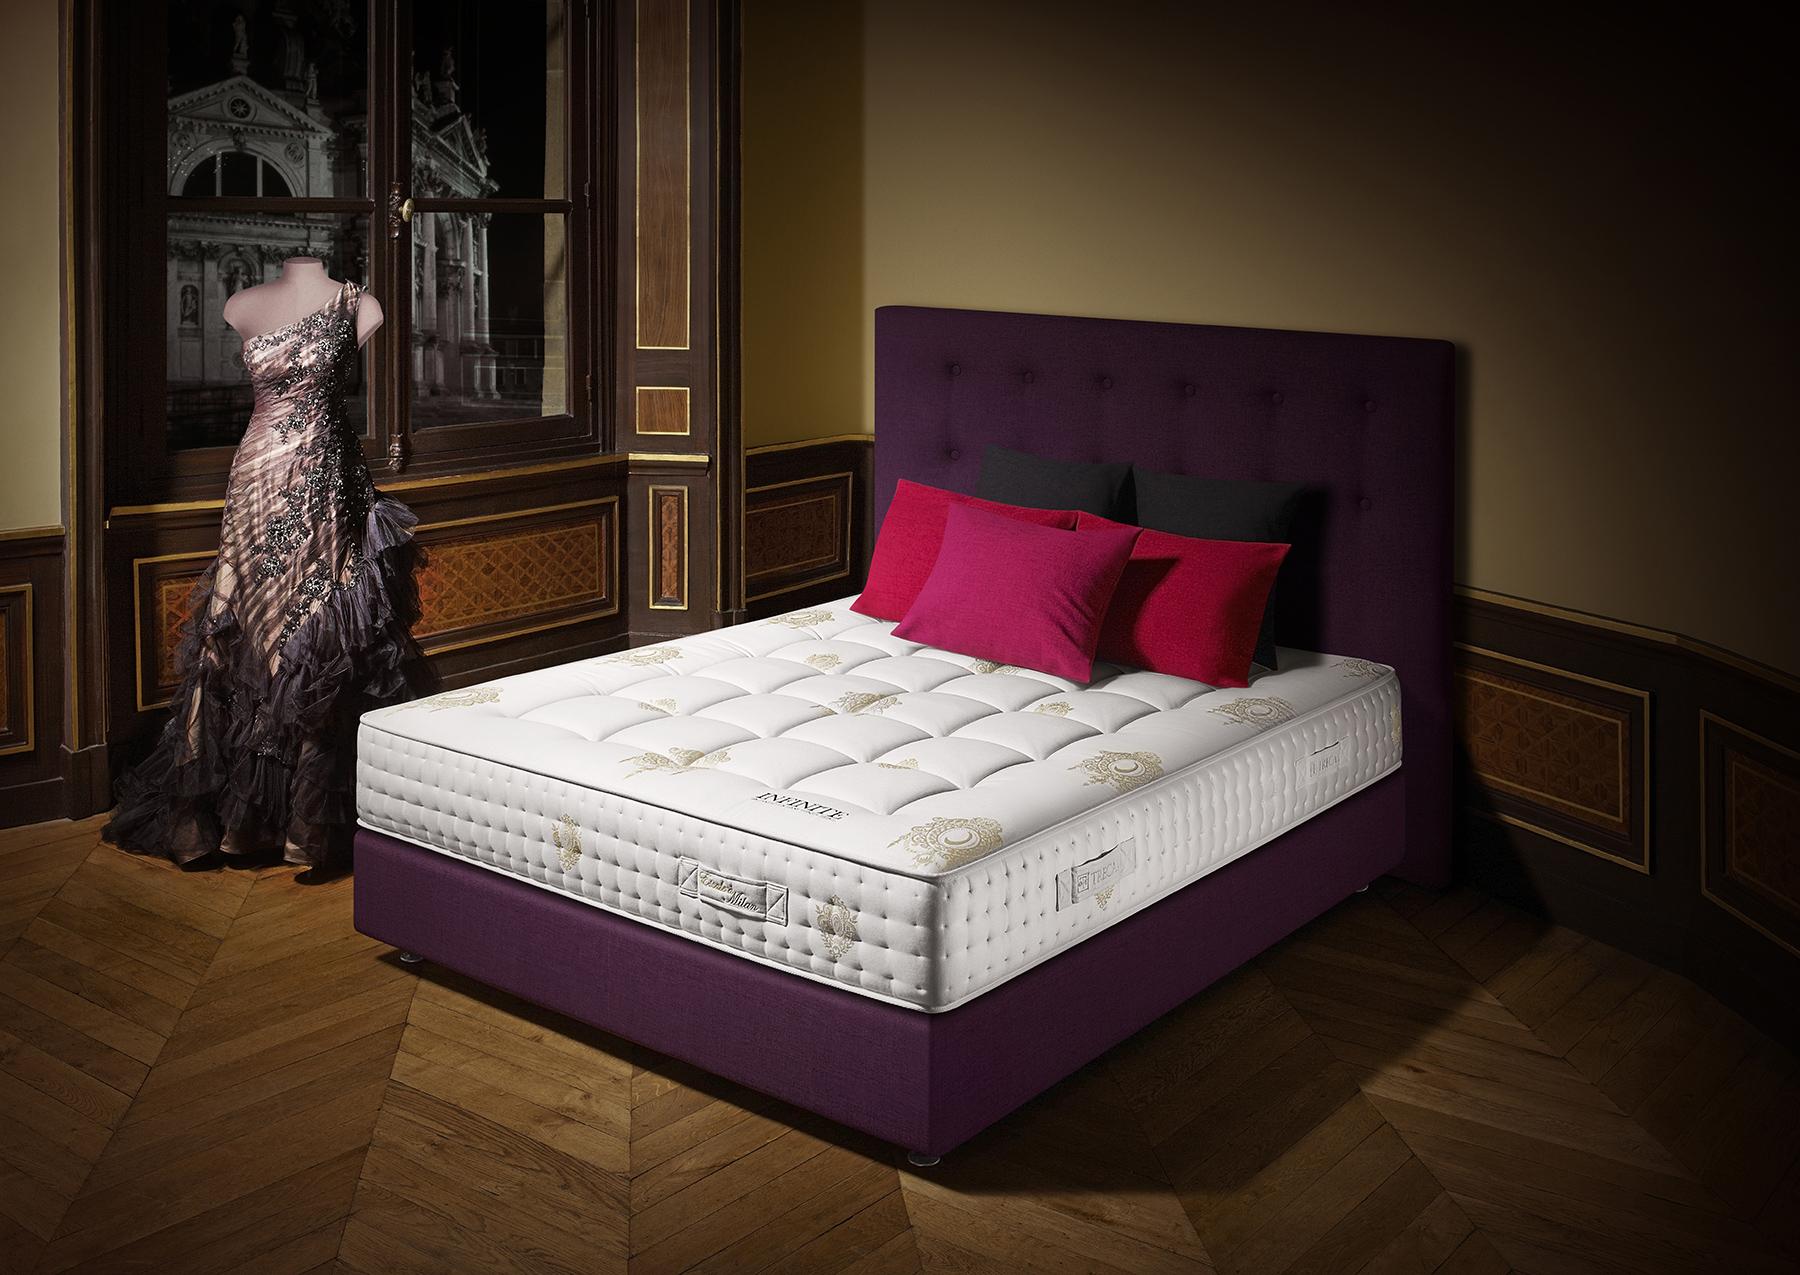 grand matelas treca vous offre le summum treca. Black Bedroom Furniture Sets. Home Design Ideas